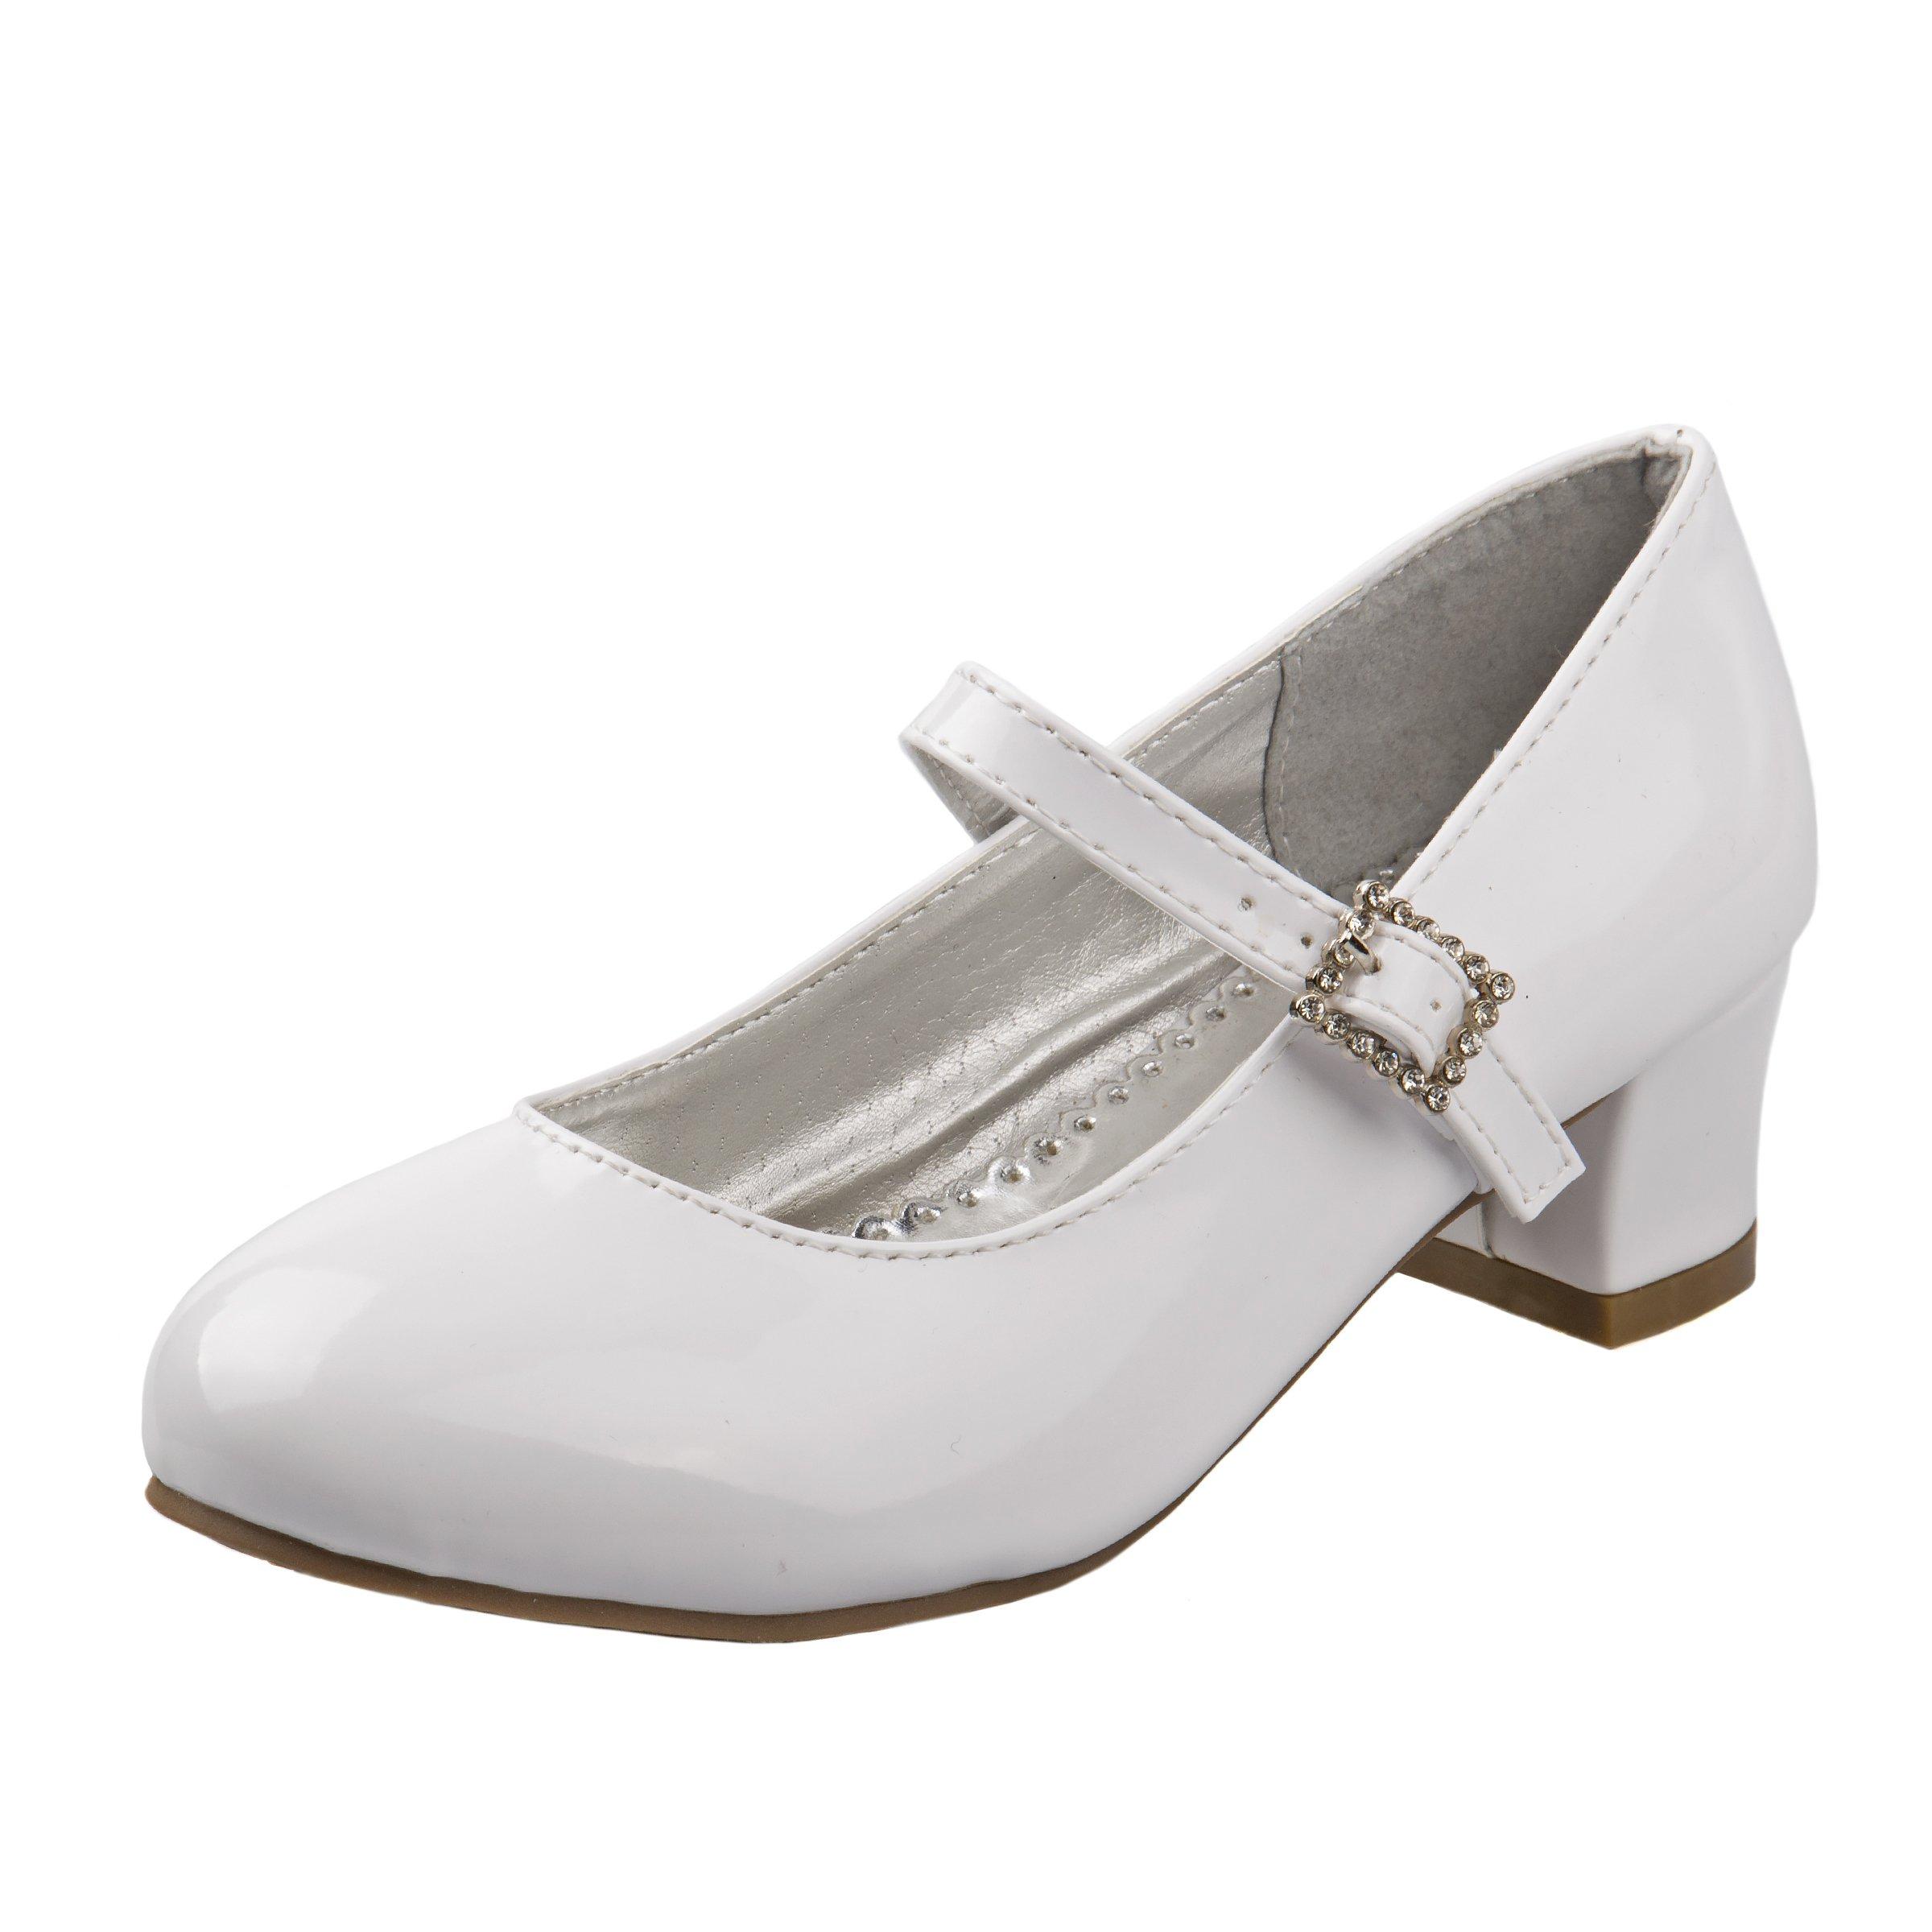 Josmo Girl's Heel Patent Dress Shoes, White Patent, 3 M US Big Kid'